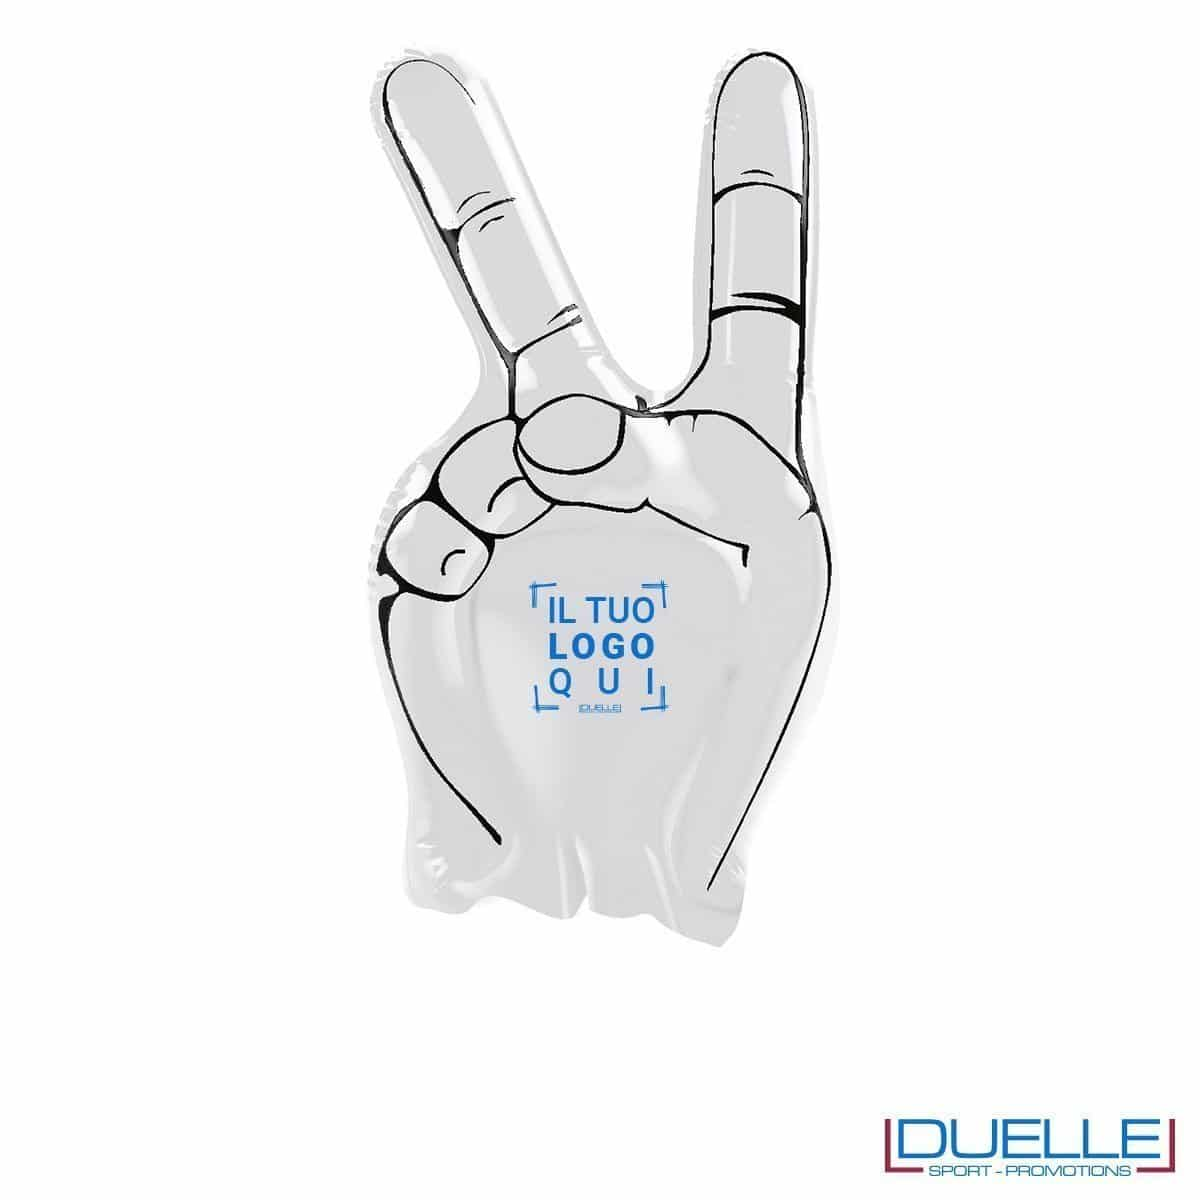 mano gonfiabile personalizzata misura extra-large bianco gadget Europei 2016, gadget tifo